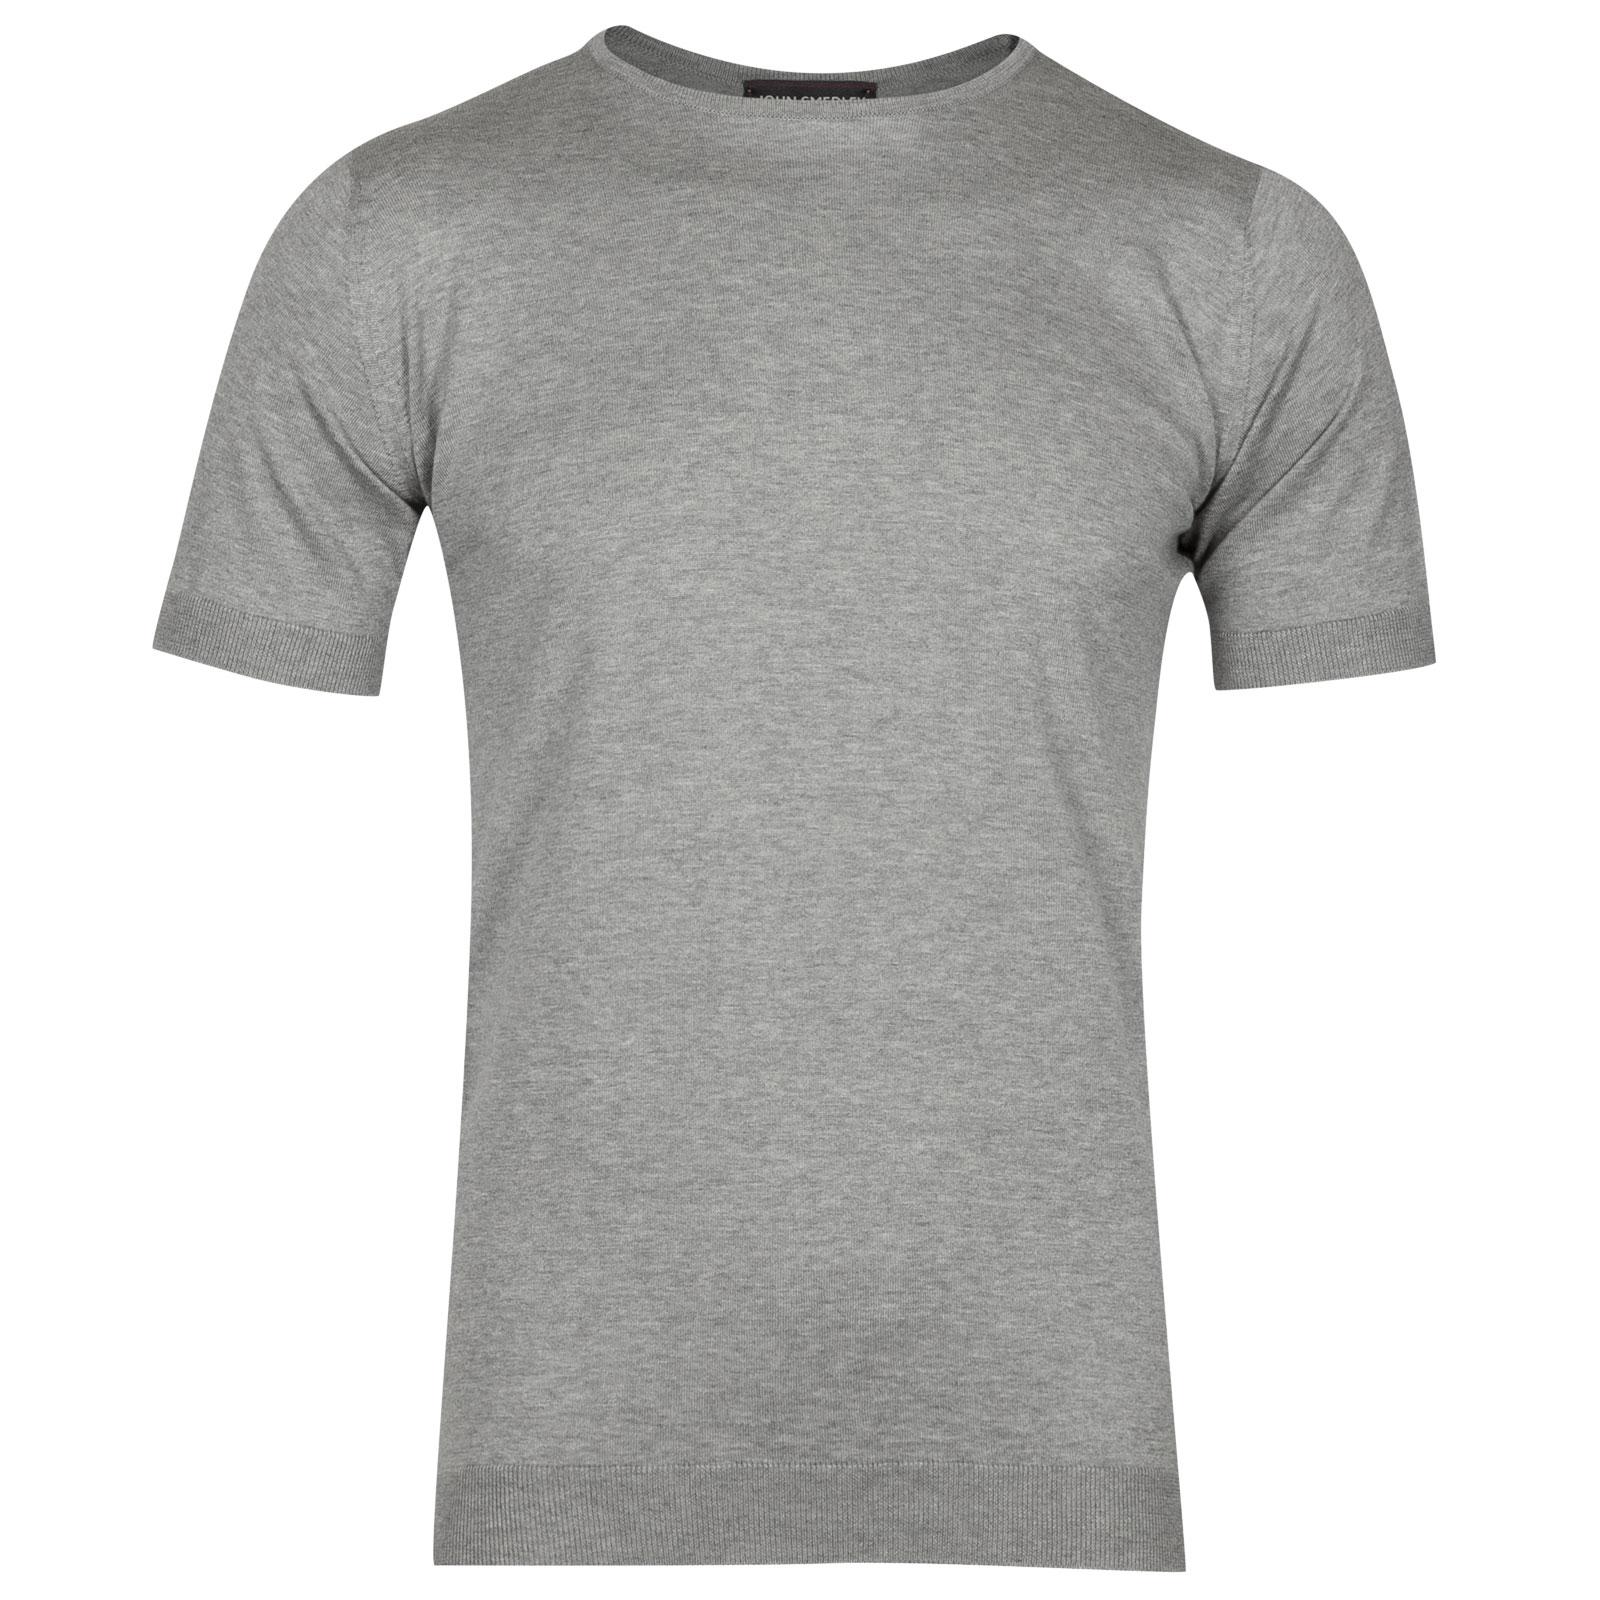 John Smedley belden Sea Island Cotton T-shirt in Silver-M